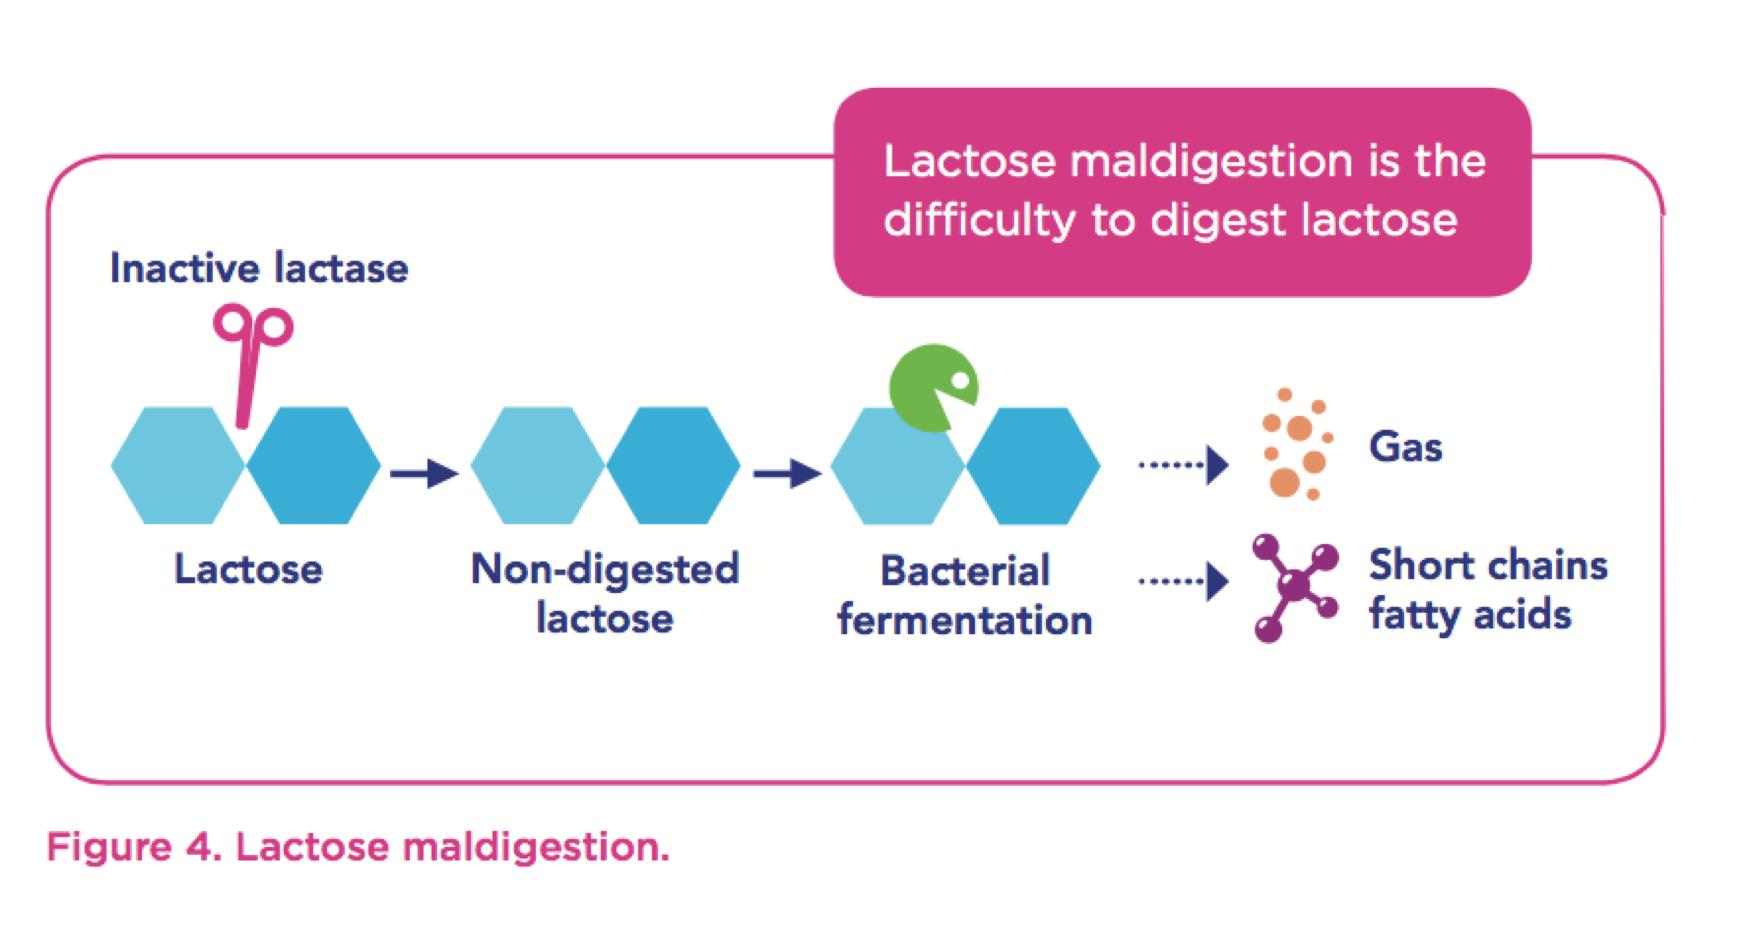 lactose-maldigestion-digest-wgo